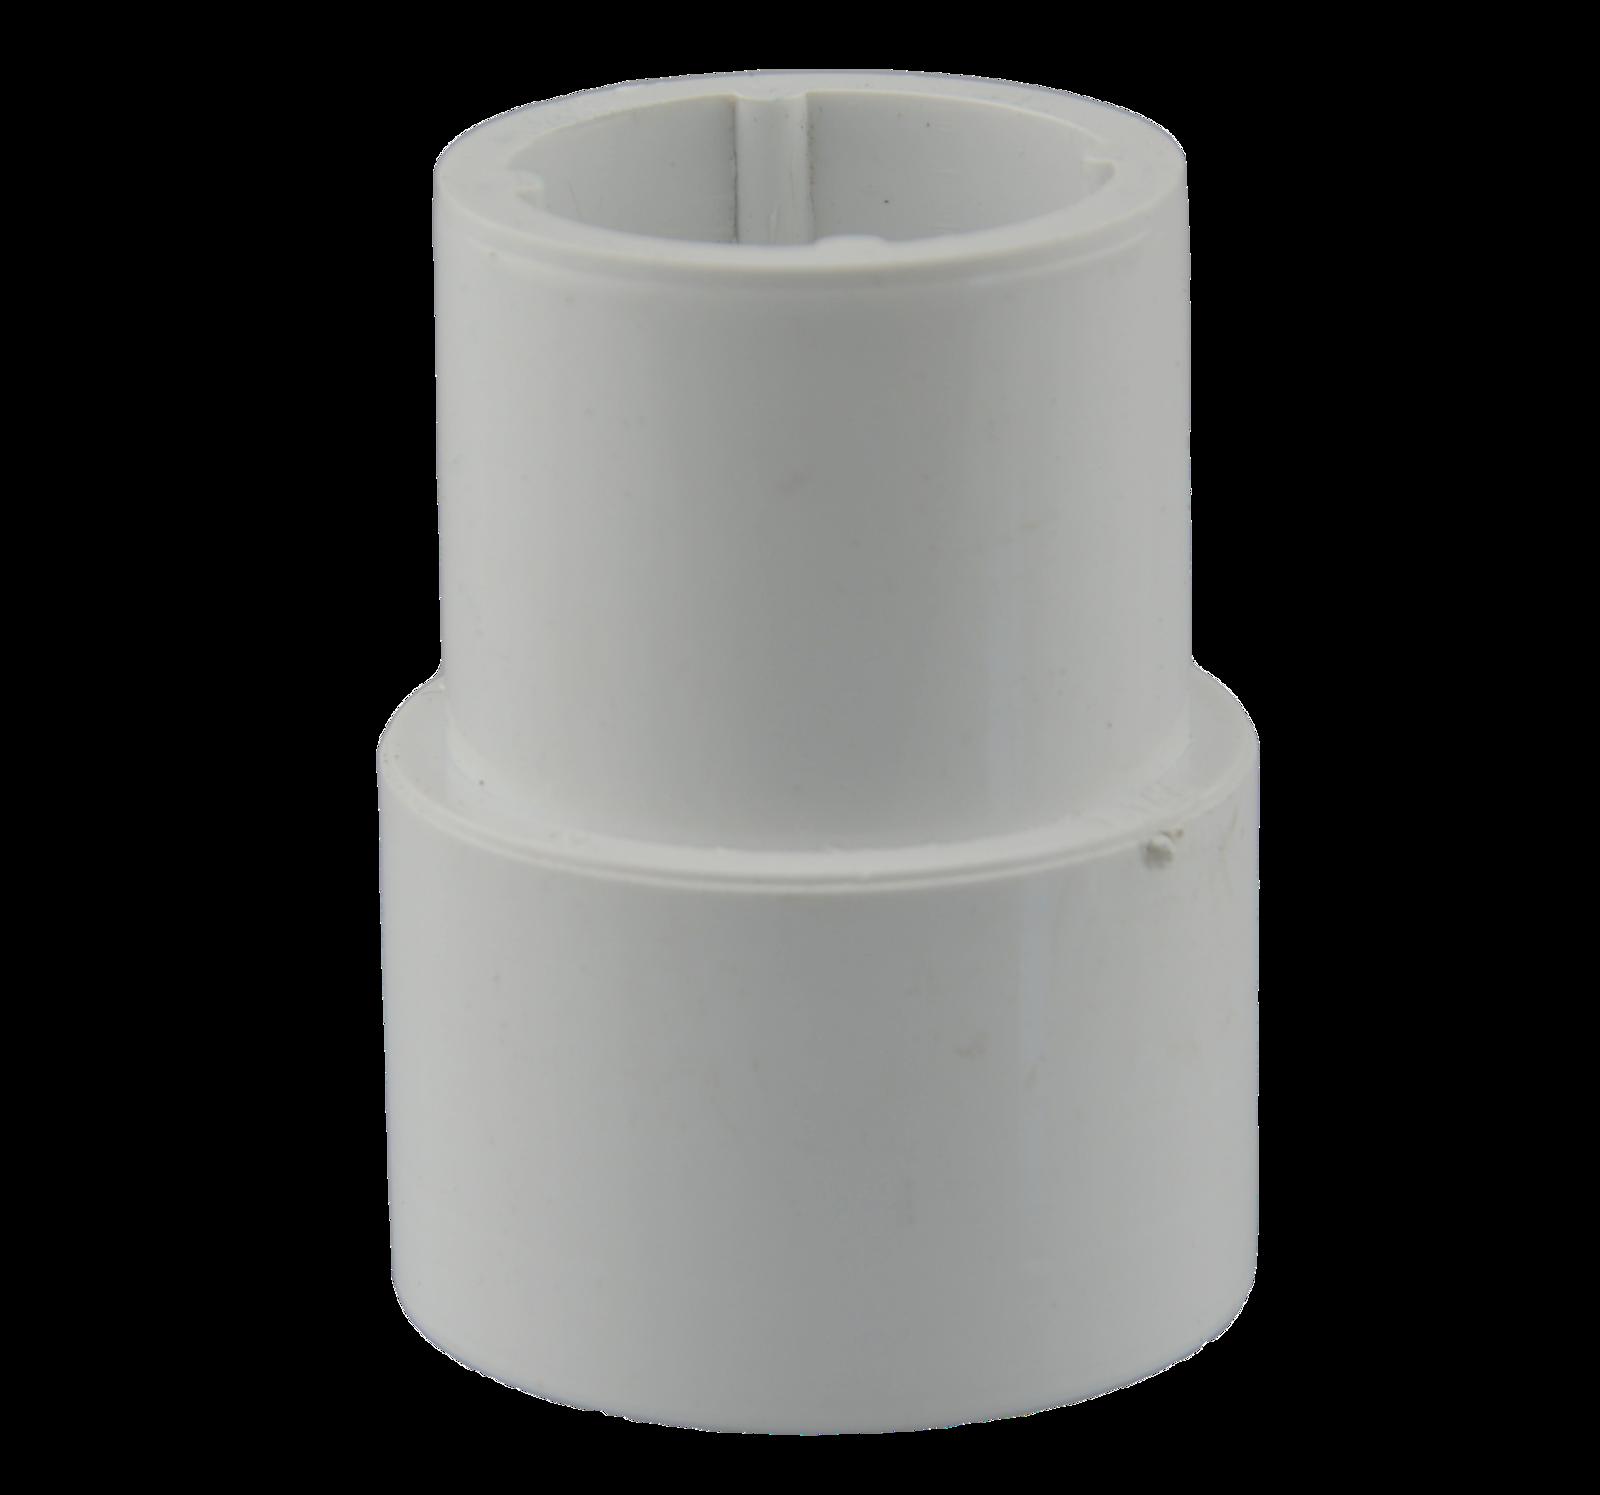 Magicmend 1 5 Quot 40mm Pipe Extender Repair Fitting Magic